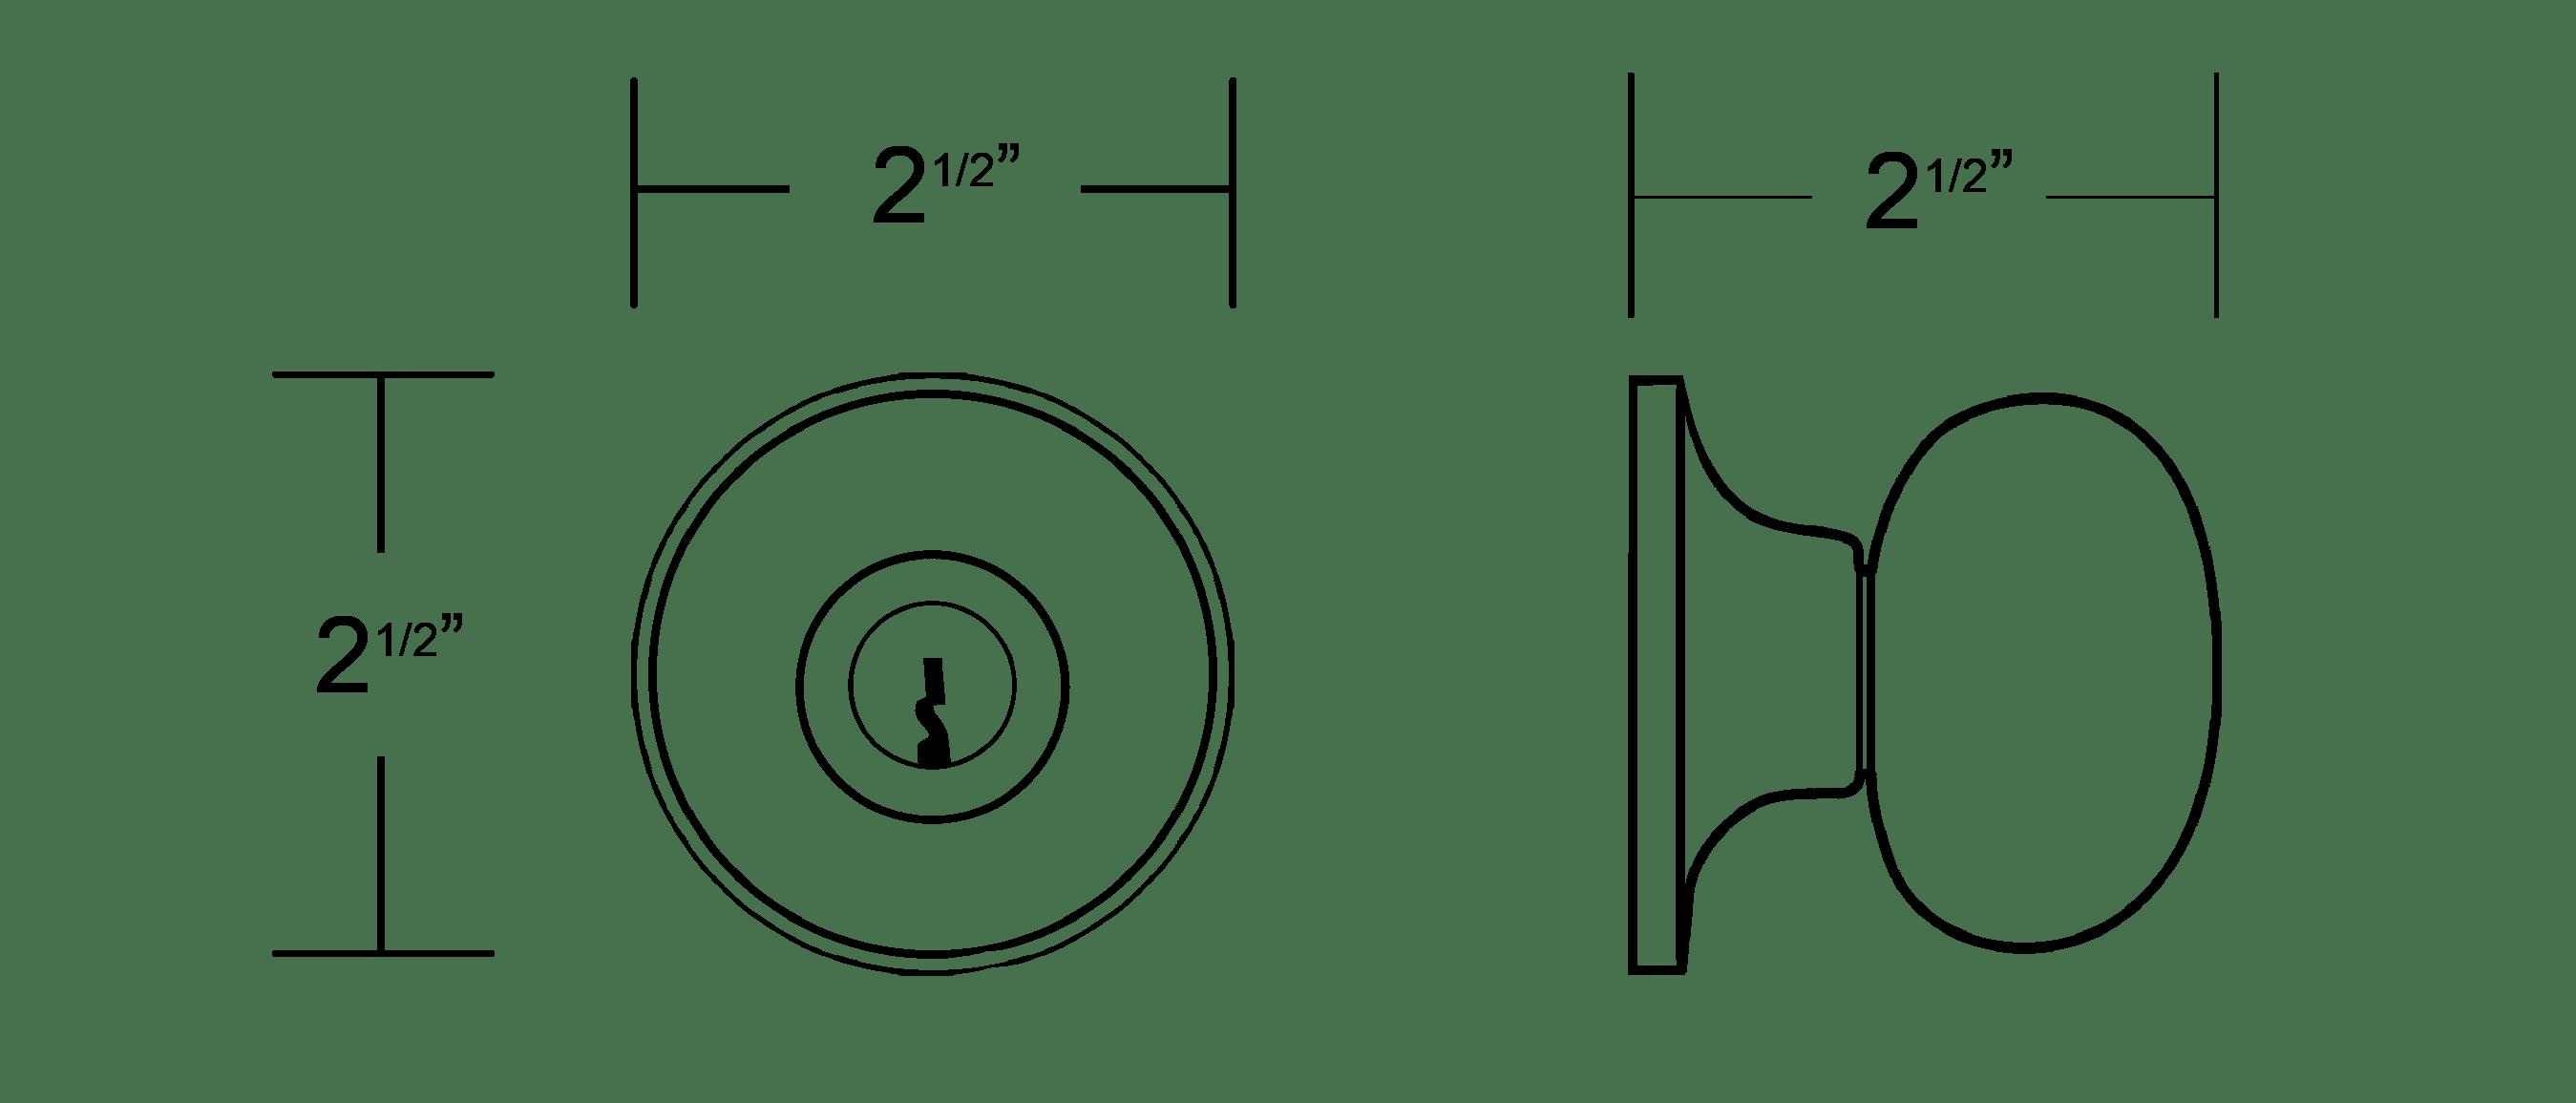 MiLocks WKK-02 Keyless Entry Knob Door Lock with RF Remote